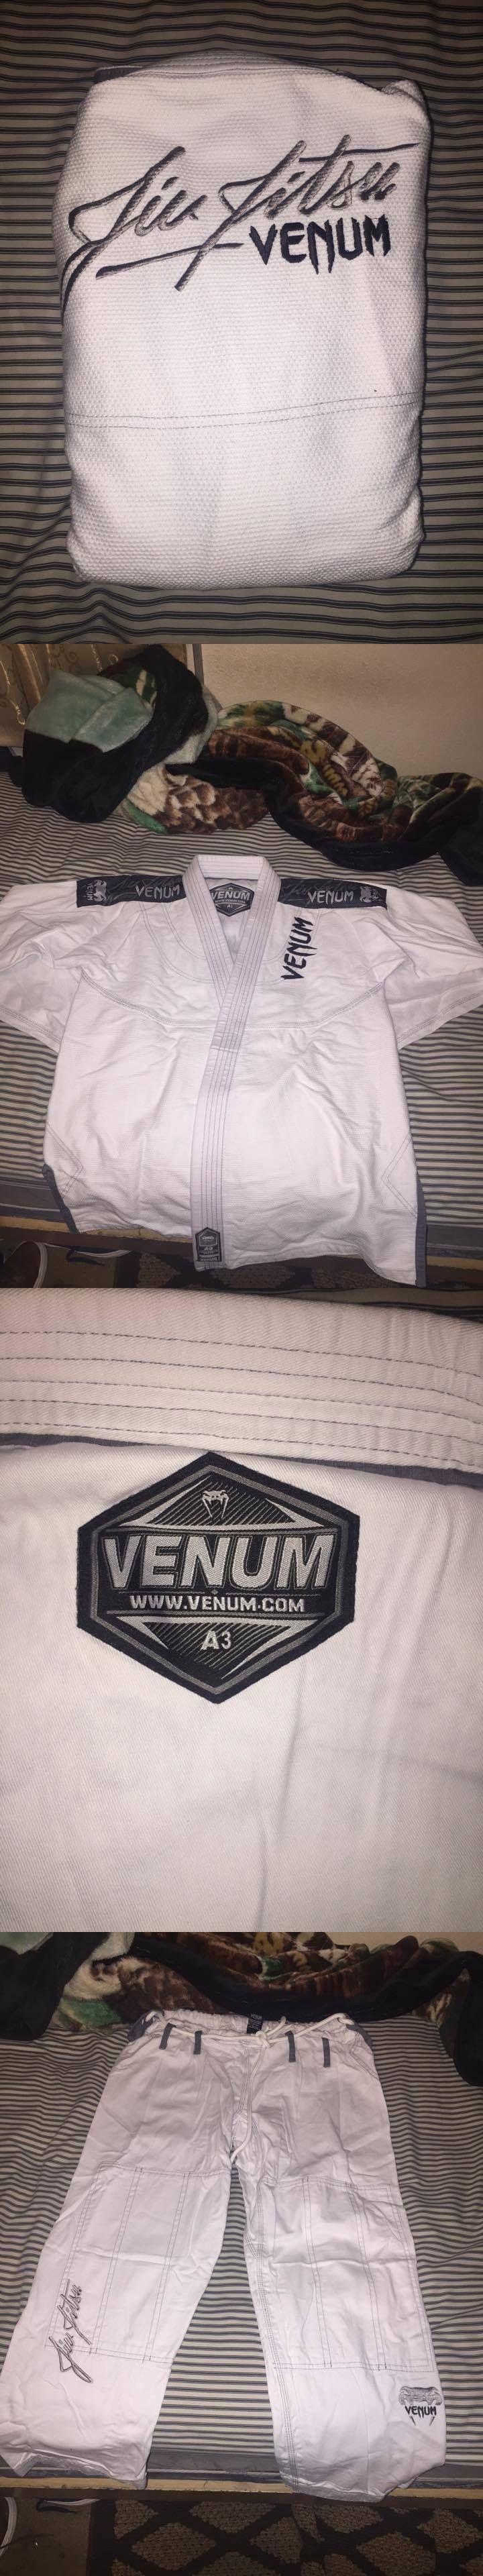 Uniforms and Gis 179774: New! Venum Jiu Jitsu Gi -White A3 Pants And Jacket- Brand New -> BUY IT NOW ONLY: $100 on eBay!